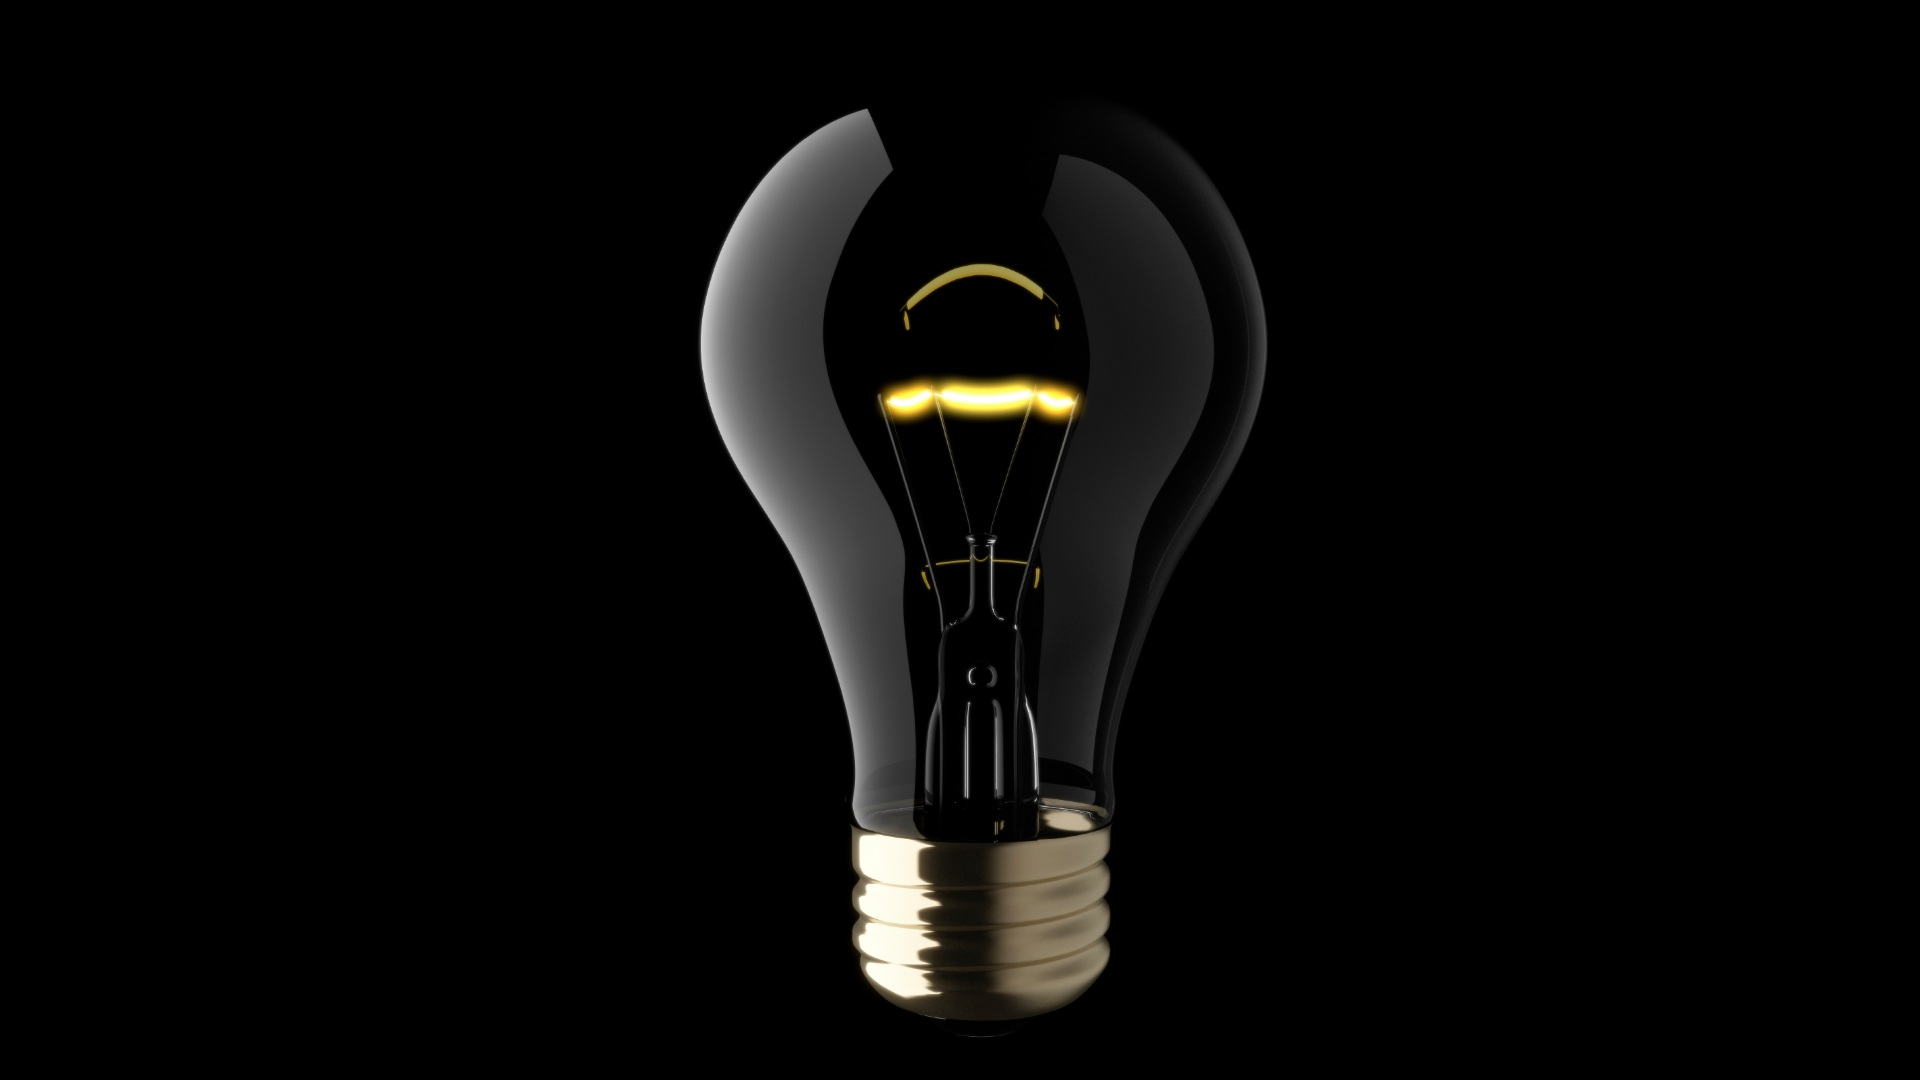 how to make a light bulb changer